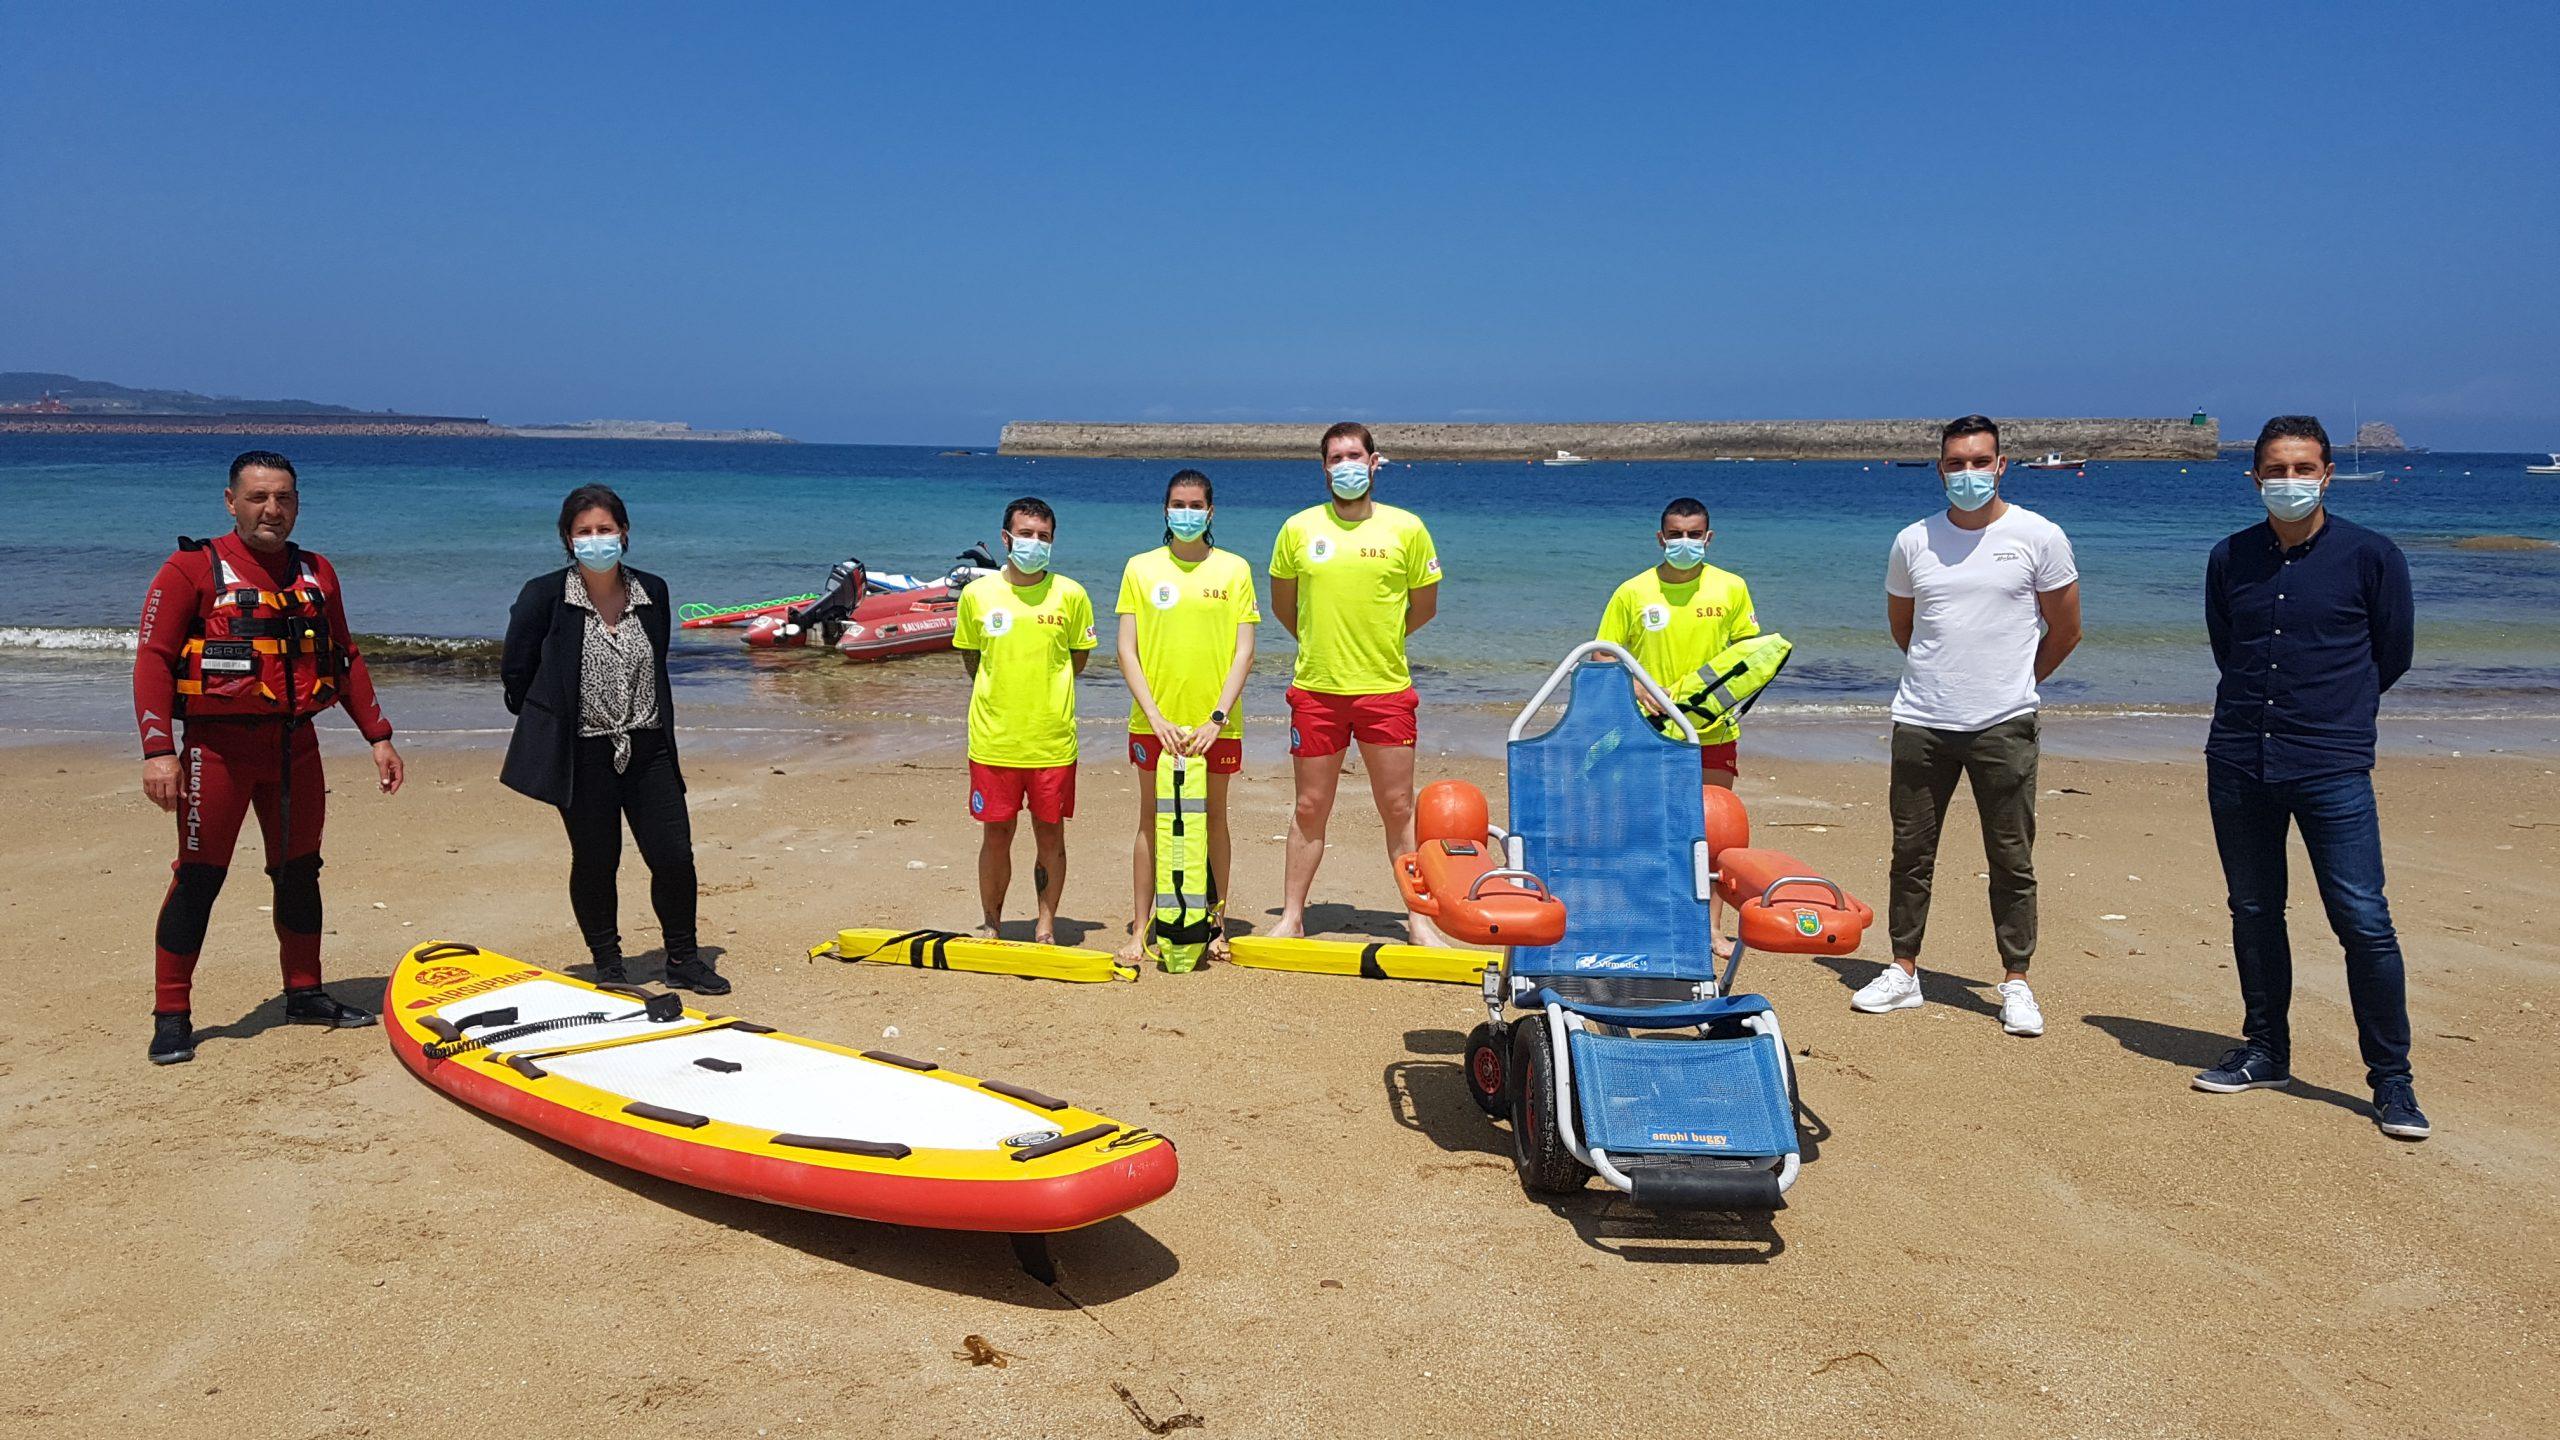 A praia do Torno estrea xullo con servizo de socorrismo